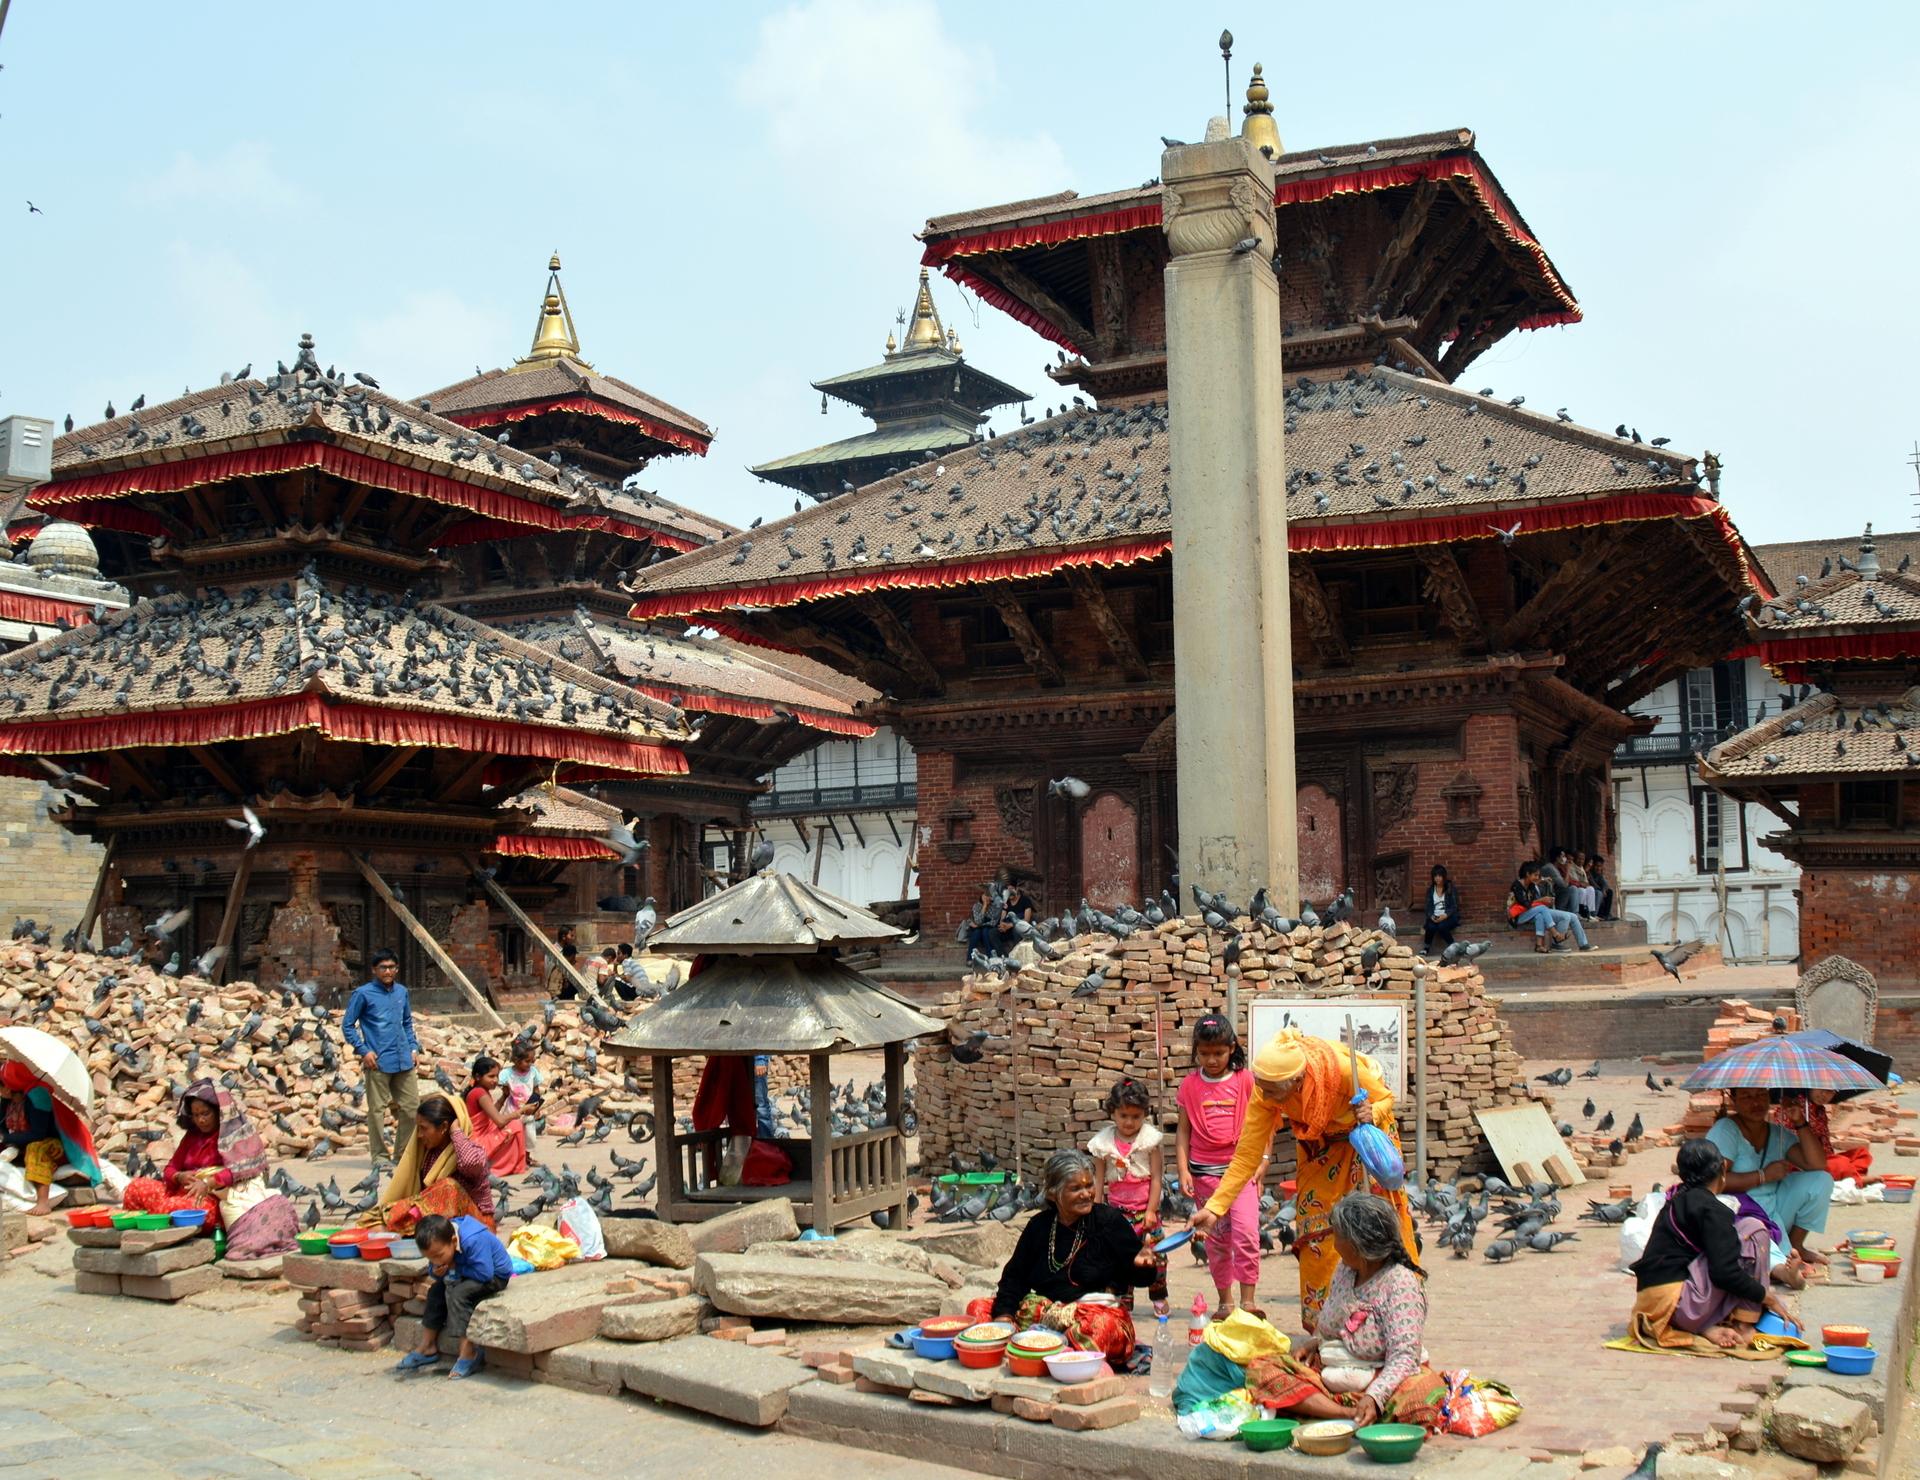 Templos e tijolos na praça Darbar, em Kathmandu